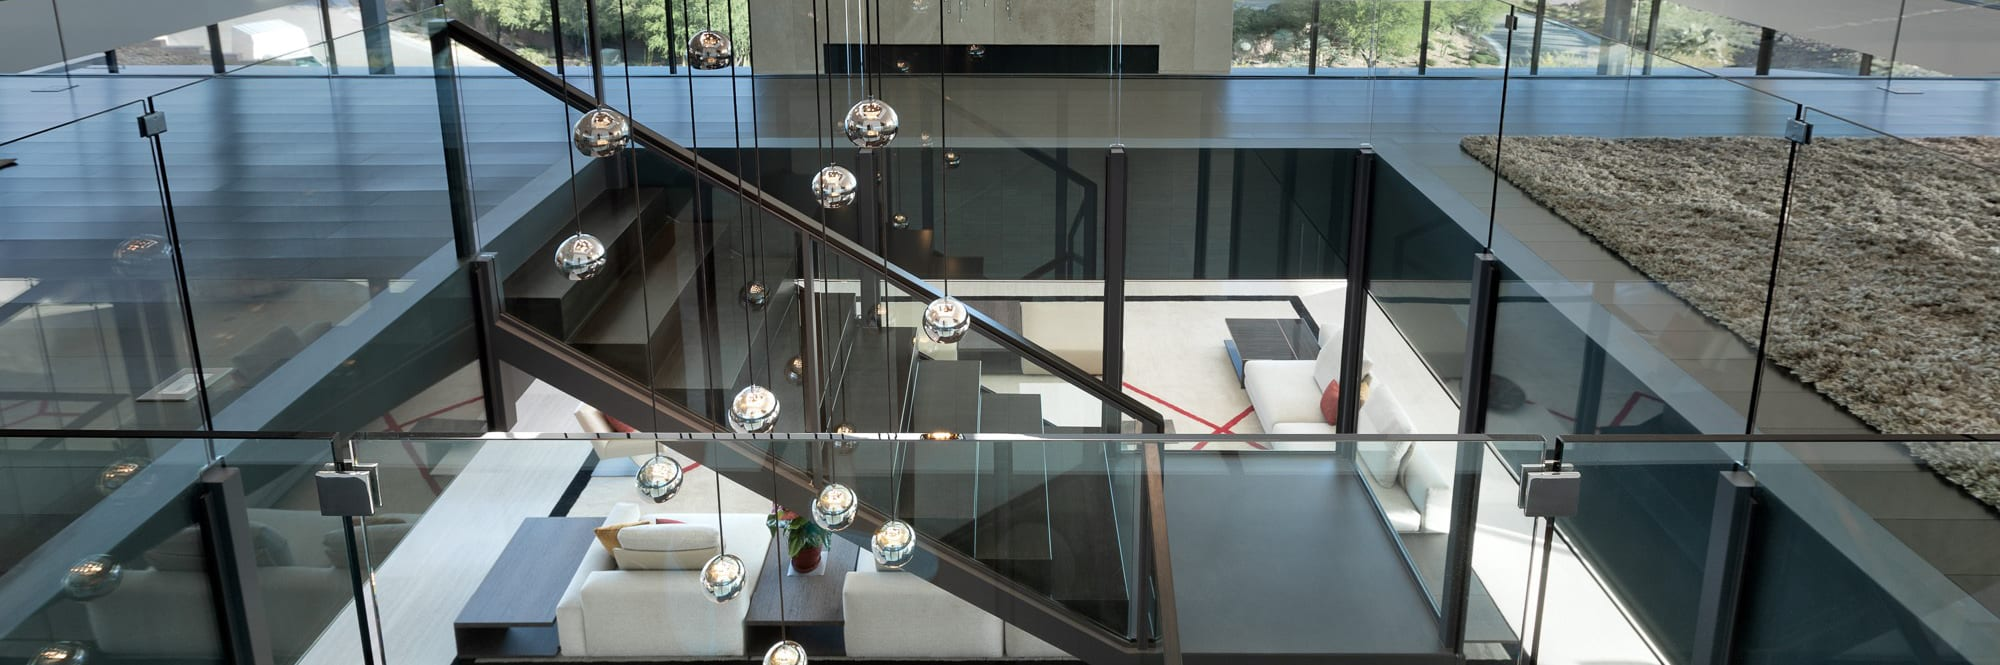 JD Stairs metal work in a custom home